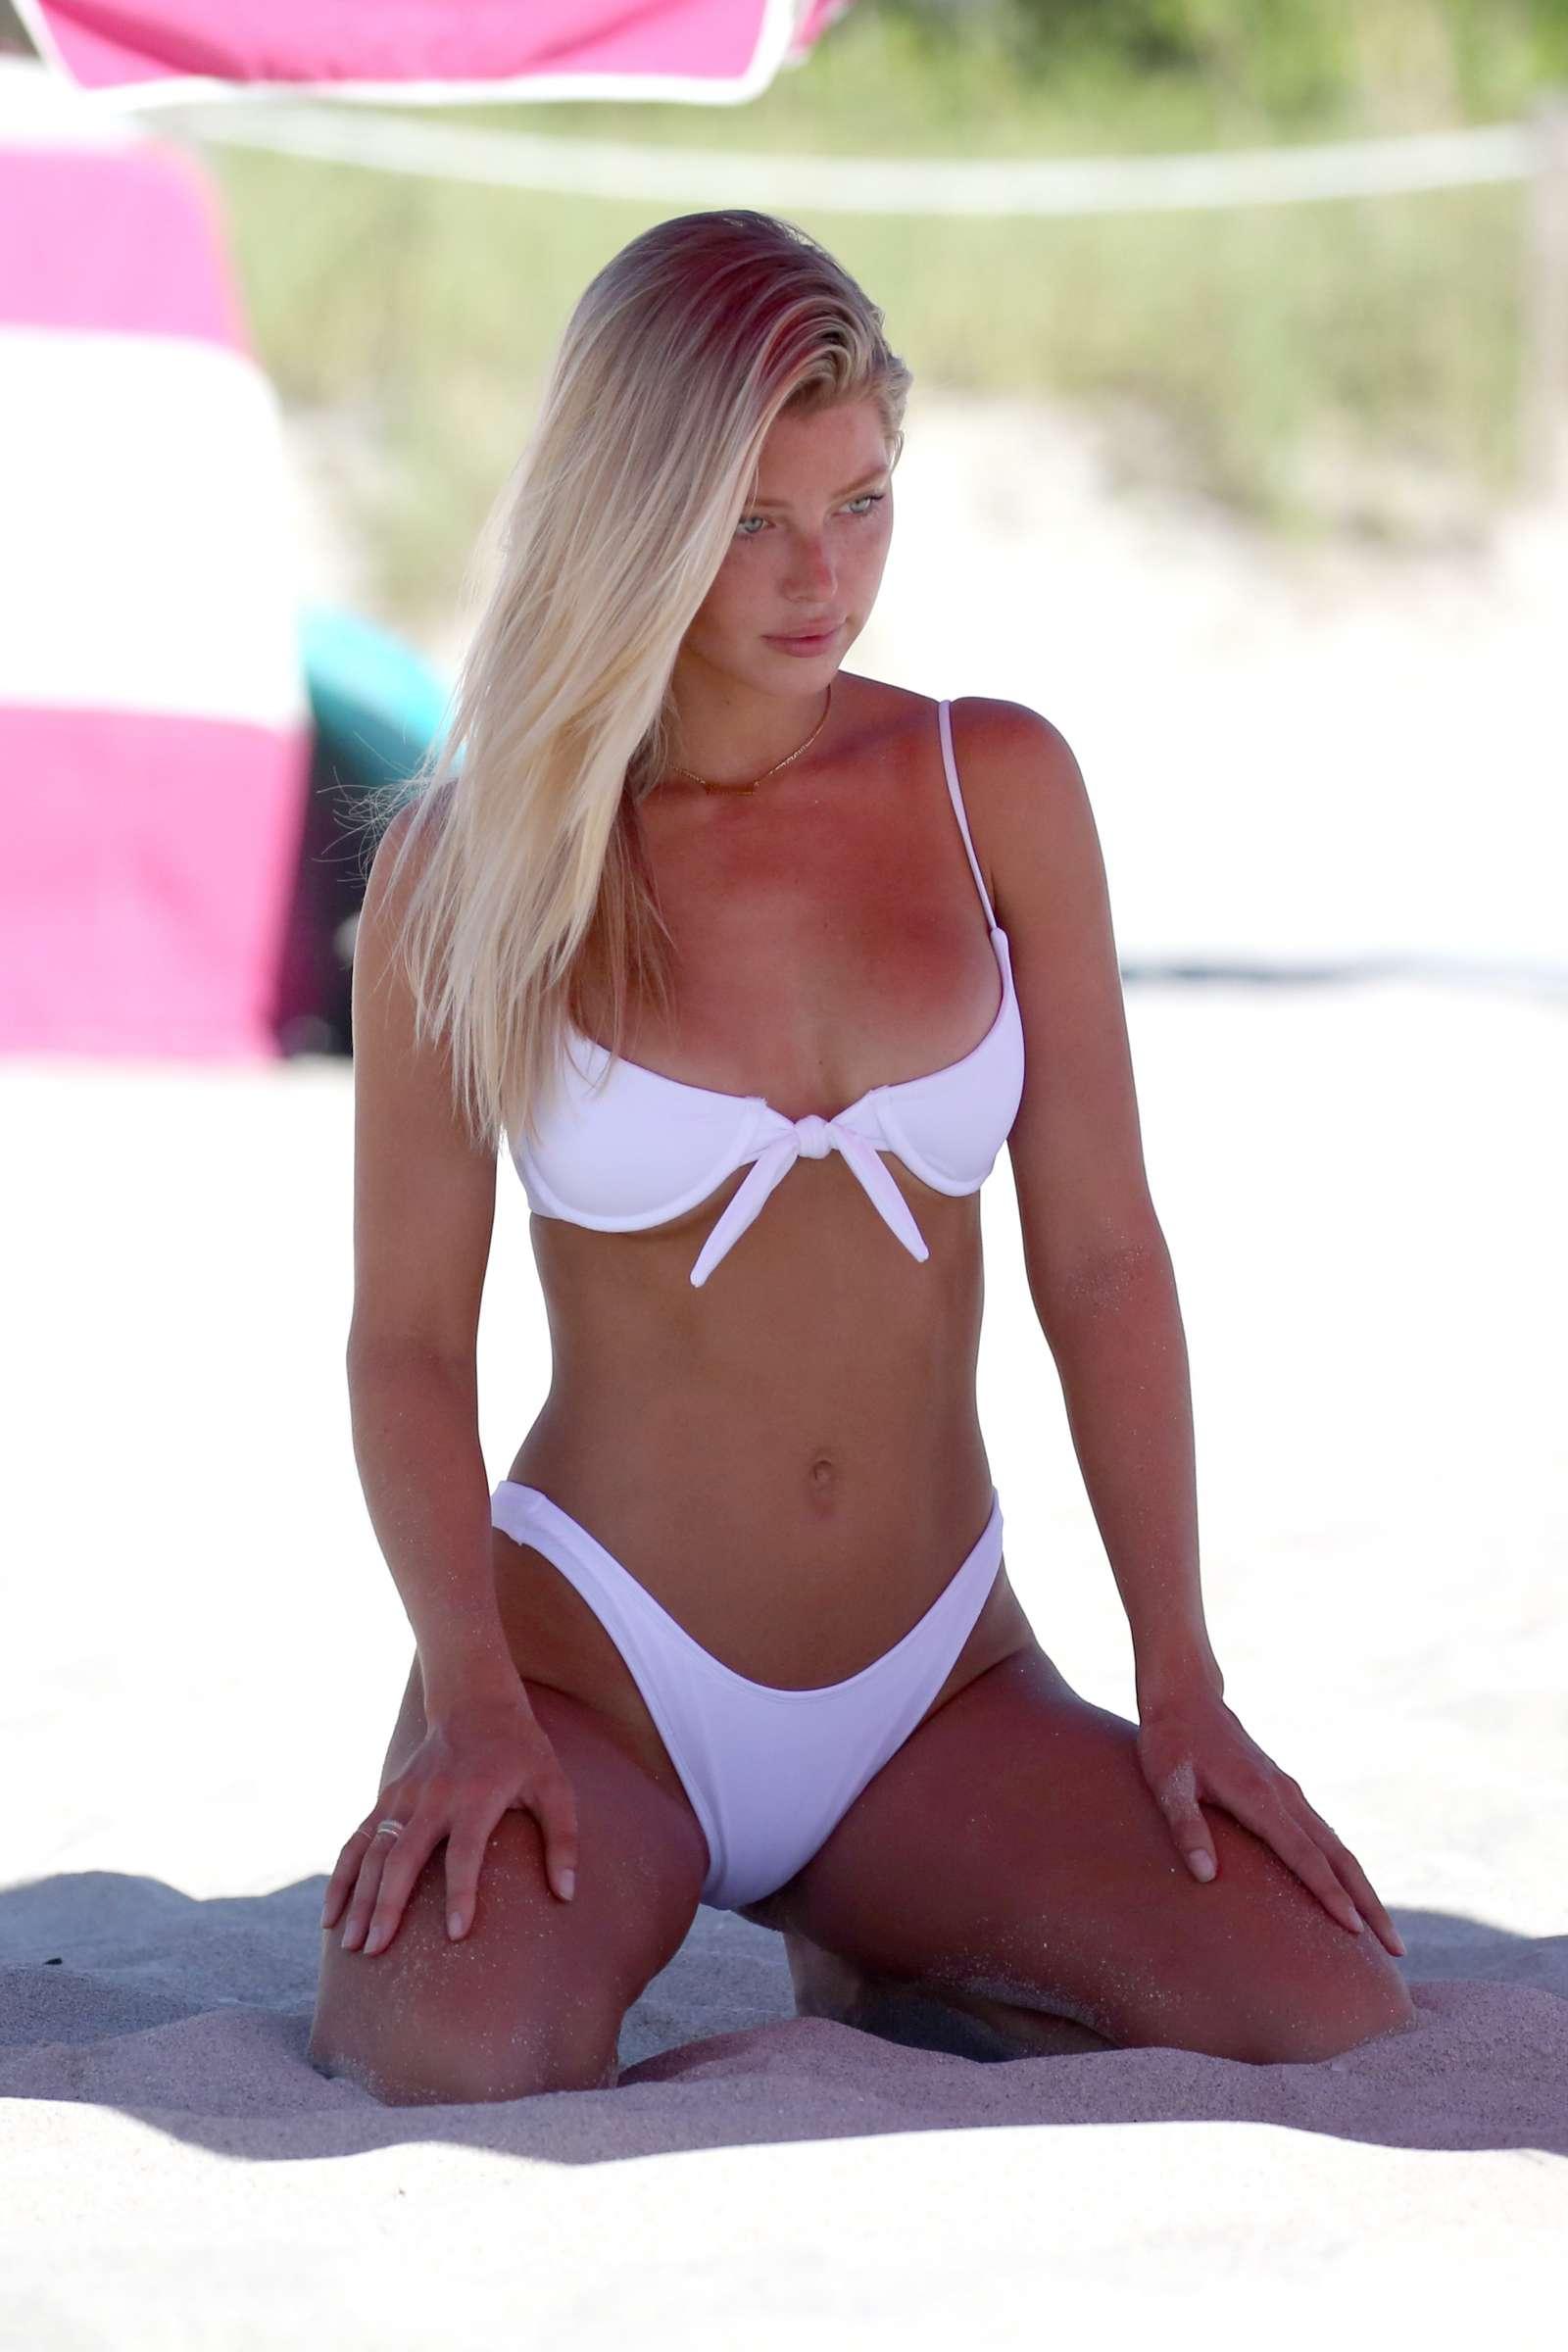 Baskin Champion in White Bikini on Miami Beach